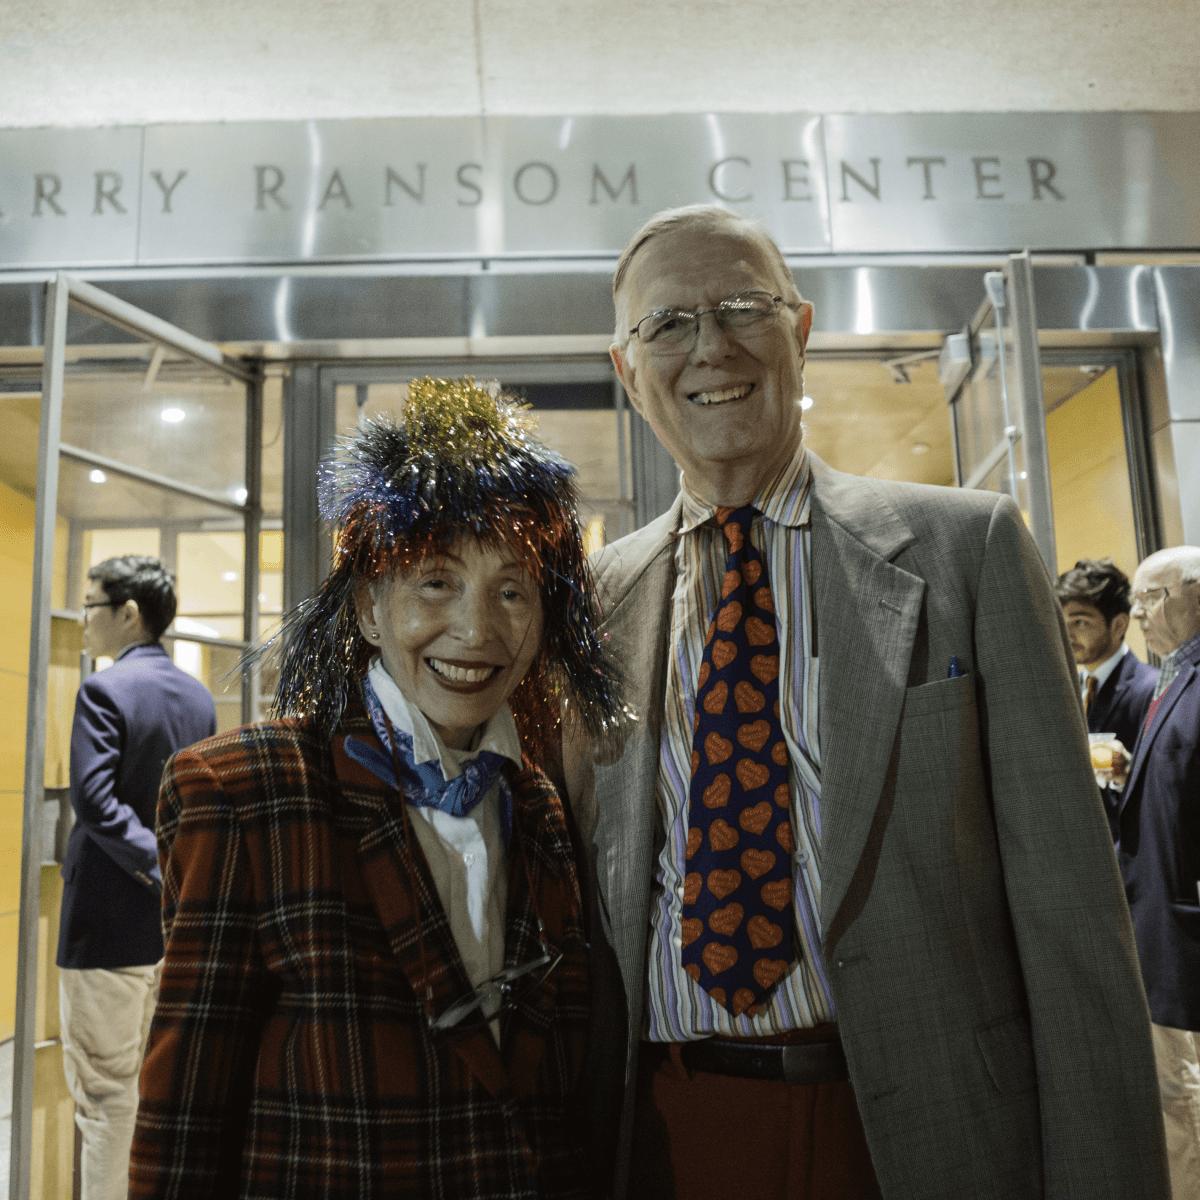 Harry Ransom Center Kaleidoscope February 2017 Judge Janice Law Donald Jansen